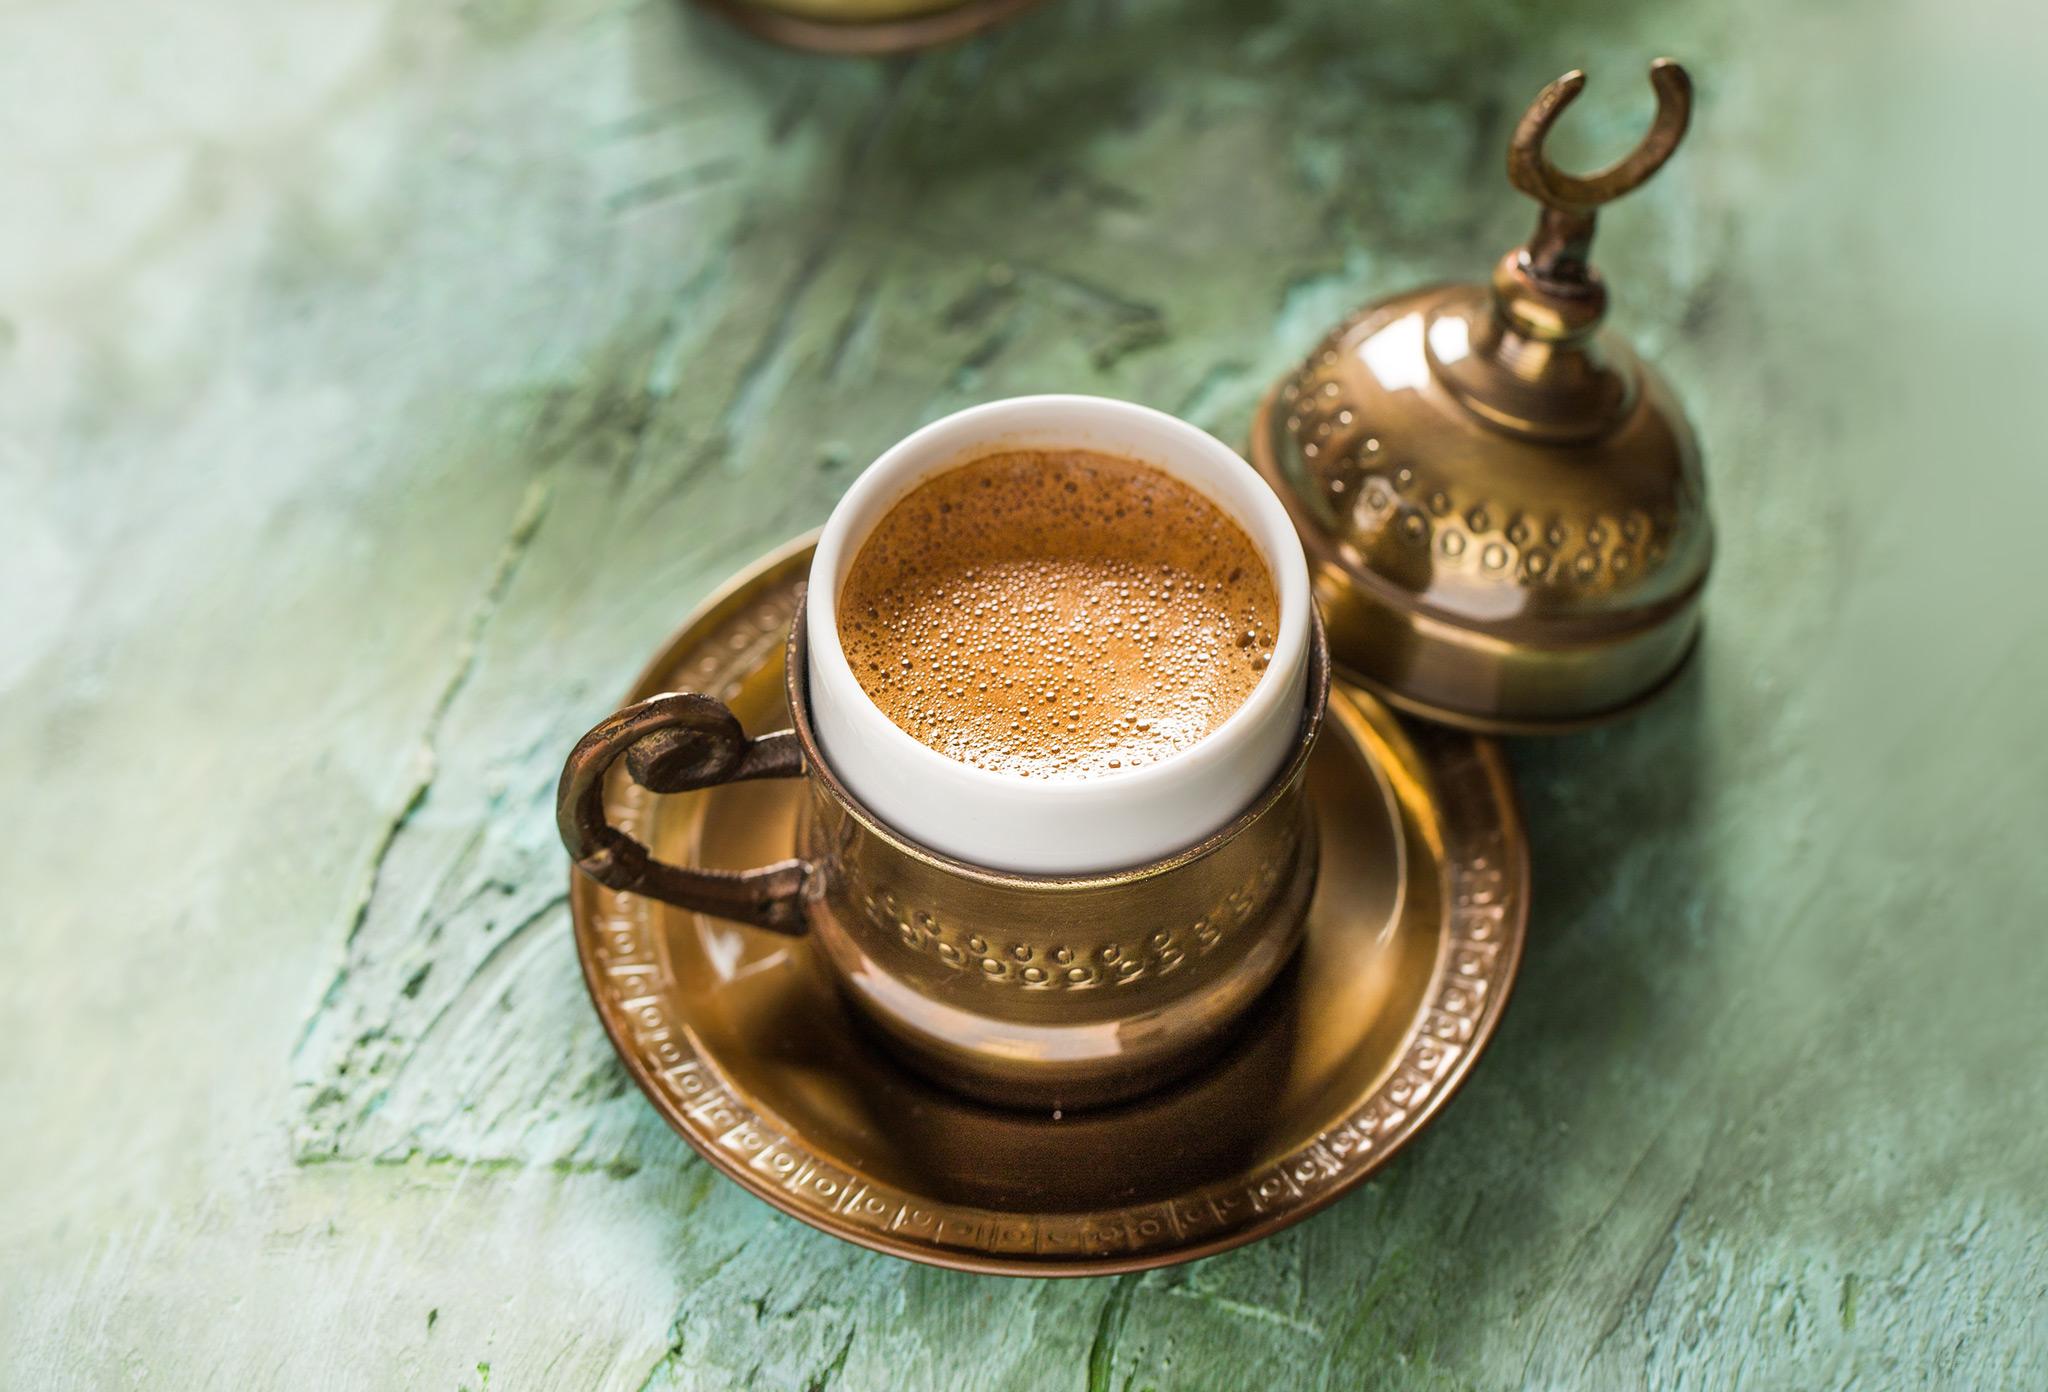 Кофе с кардамоном по-турецки